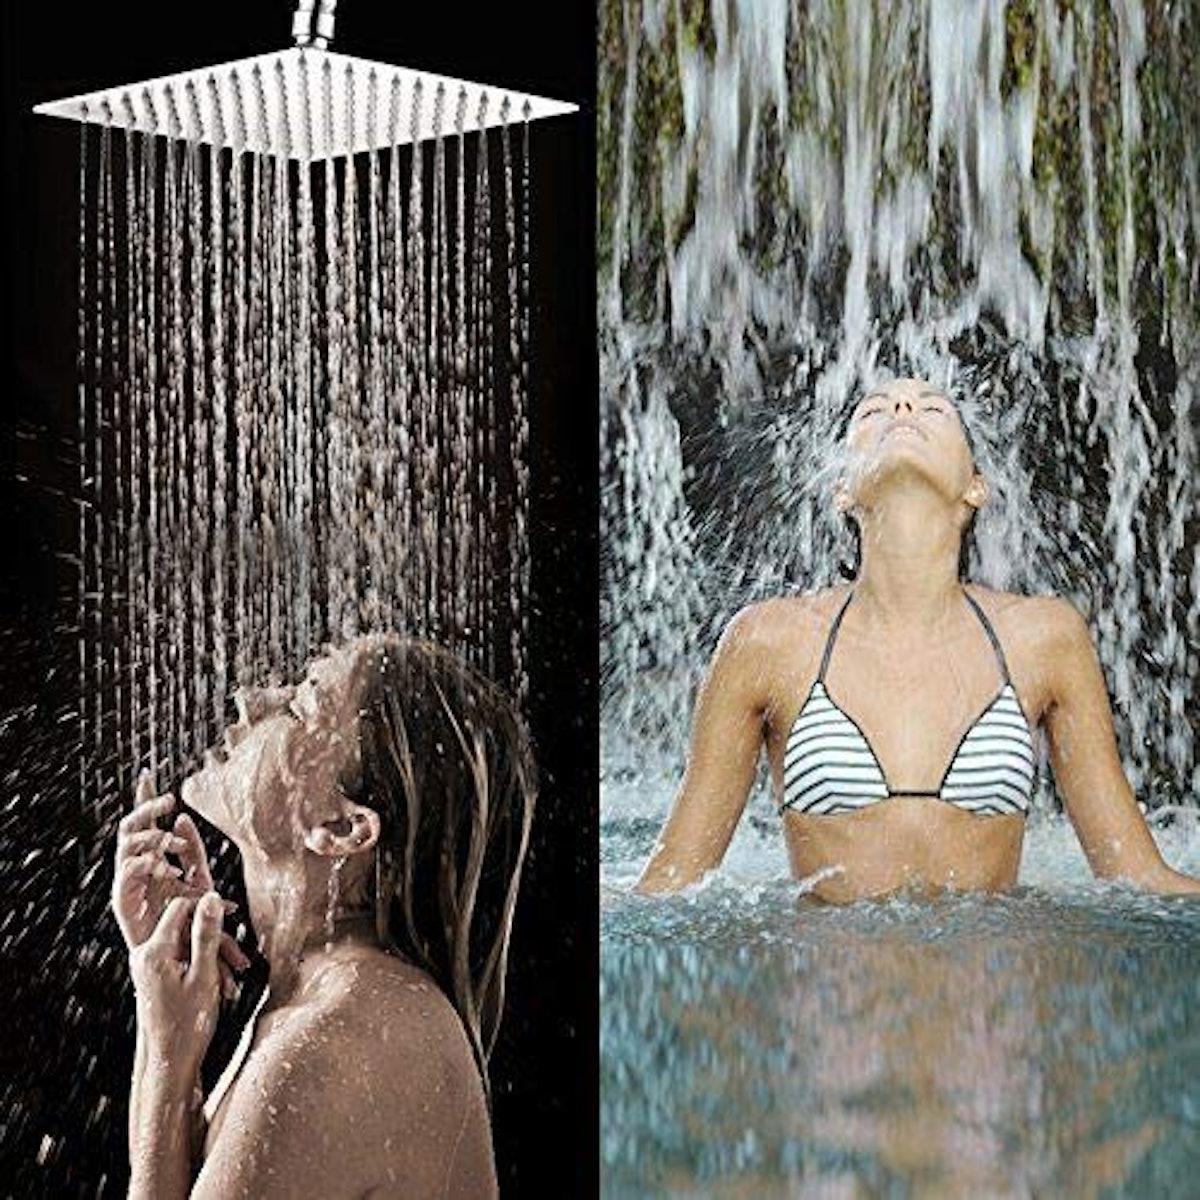 iPstyle Rainfall Shower Head